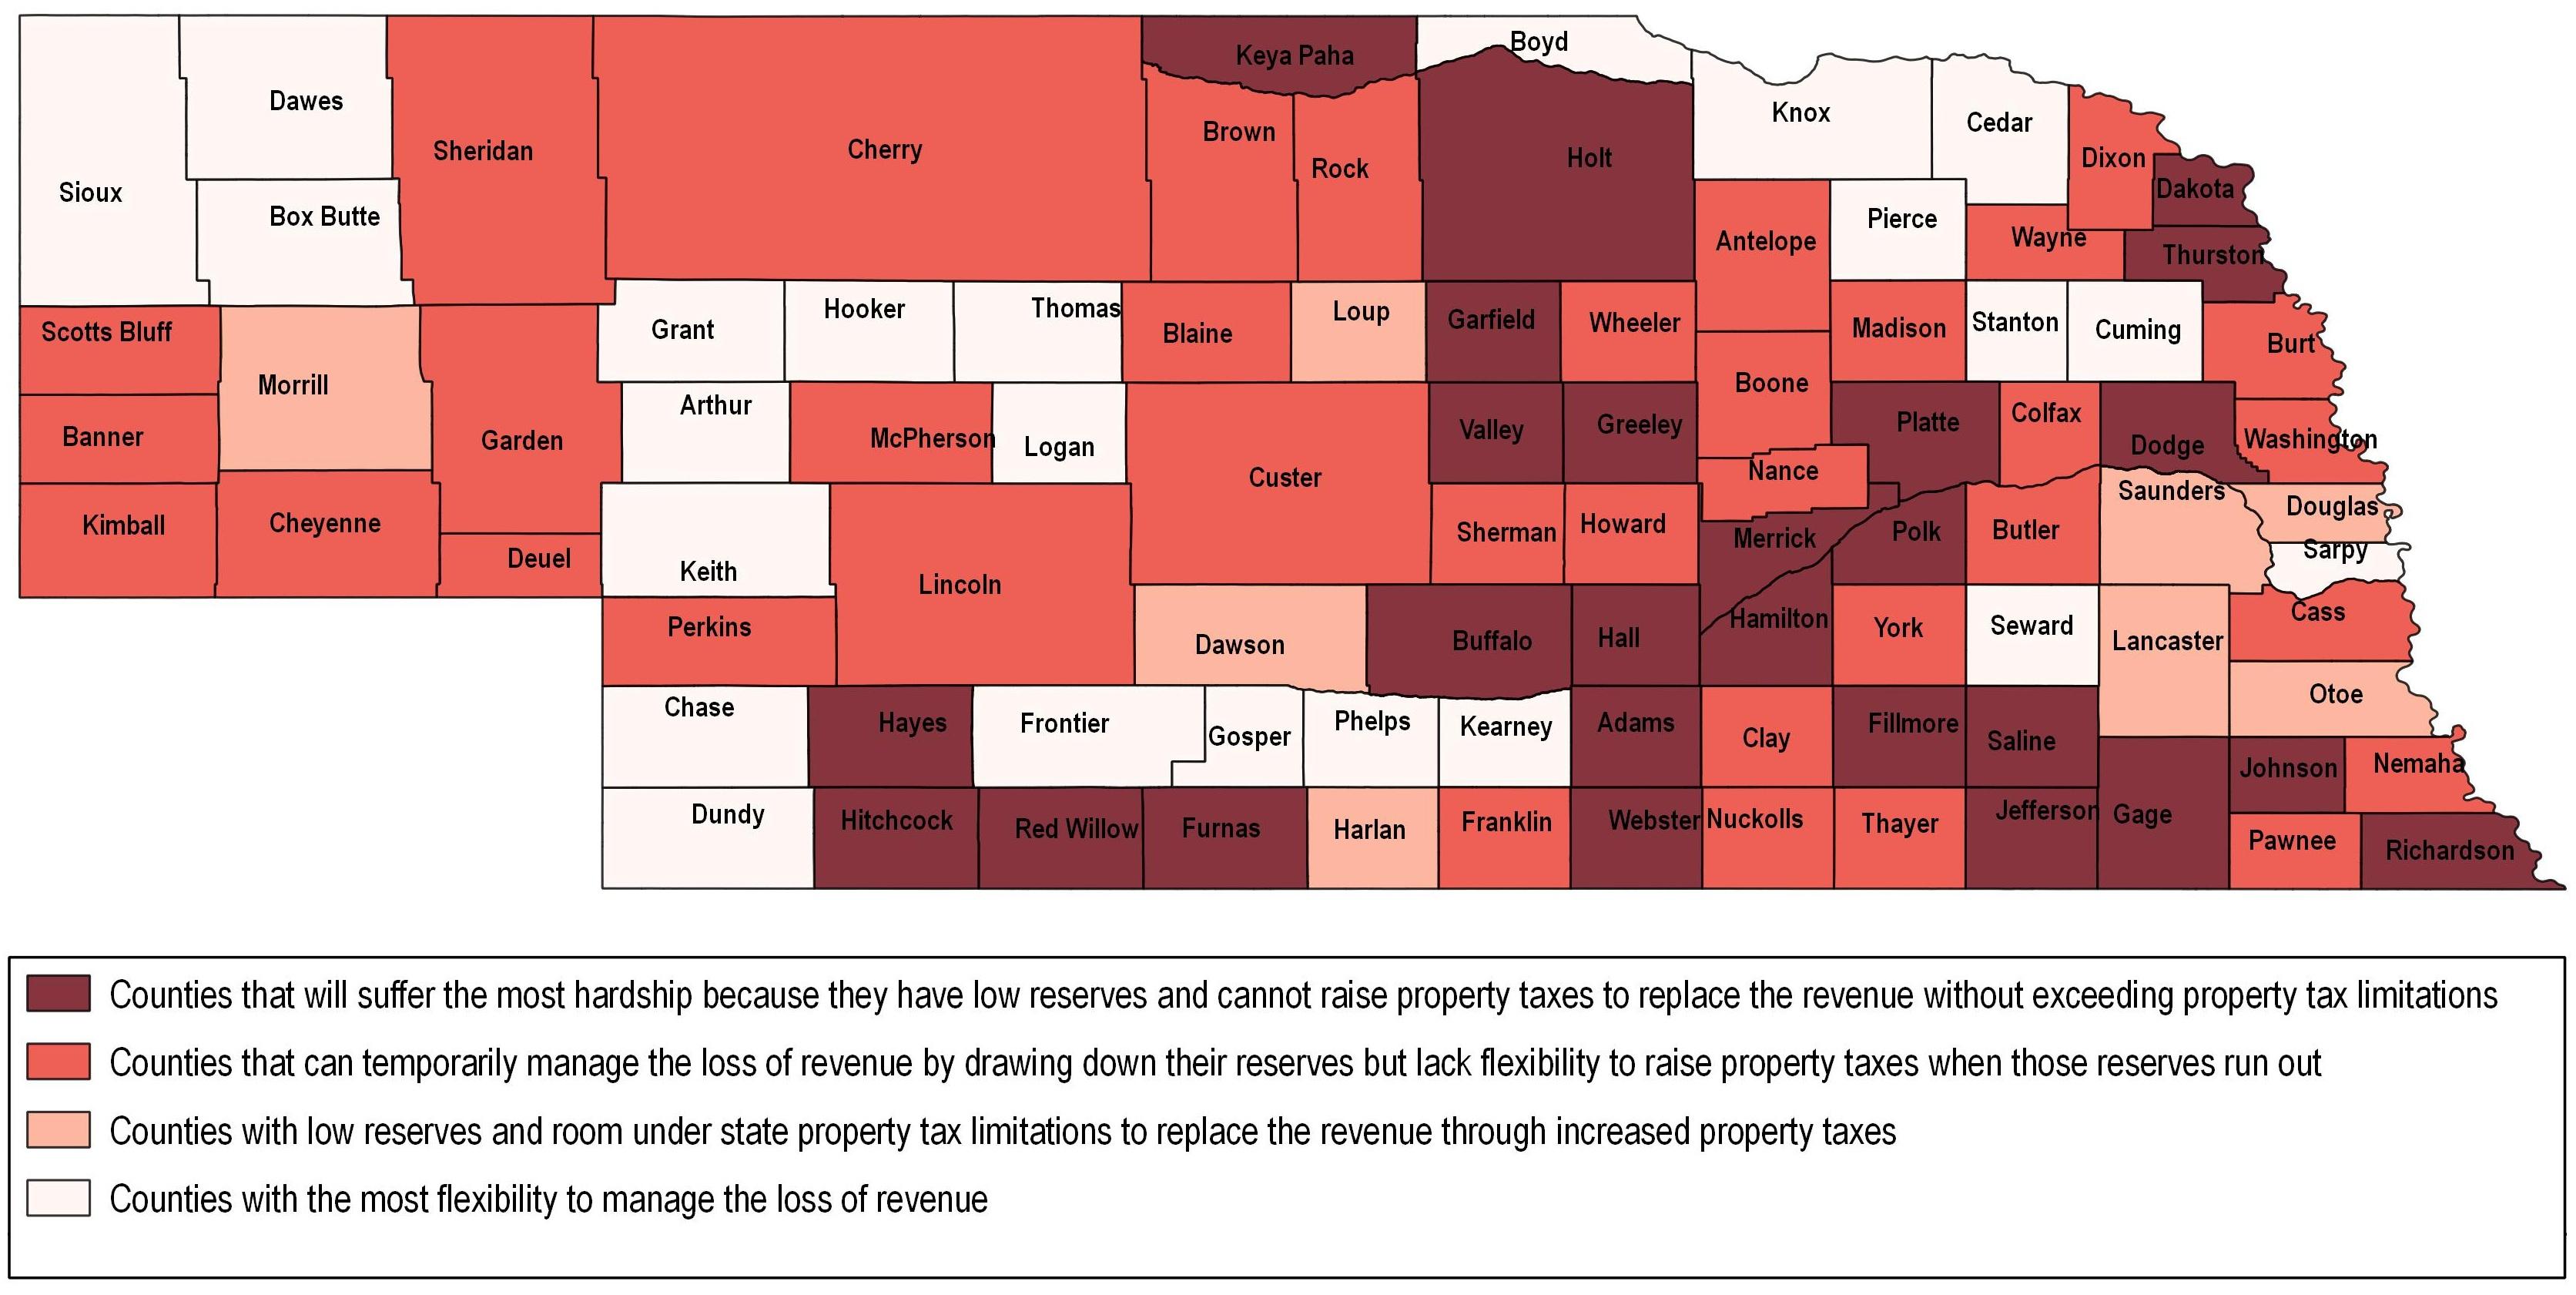 worksheet Nebraska Inheritance Tax Worksheet nebraska inheritance tax worksheet taxpayers face a cliffhanger feeling the squeeze u2013 negative effects of eliminating x worksheet